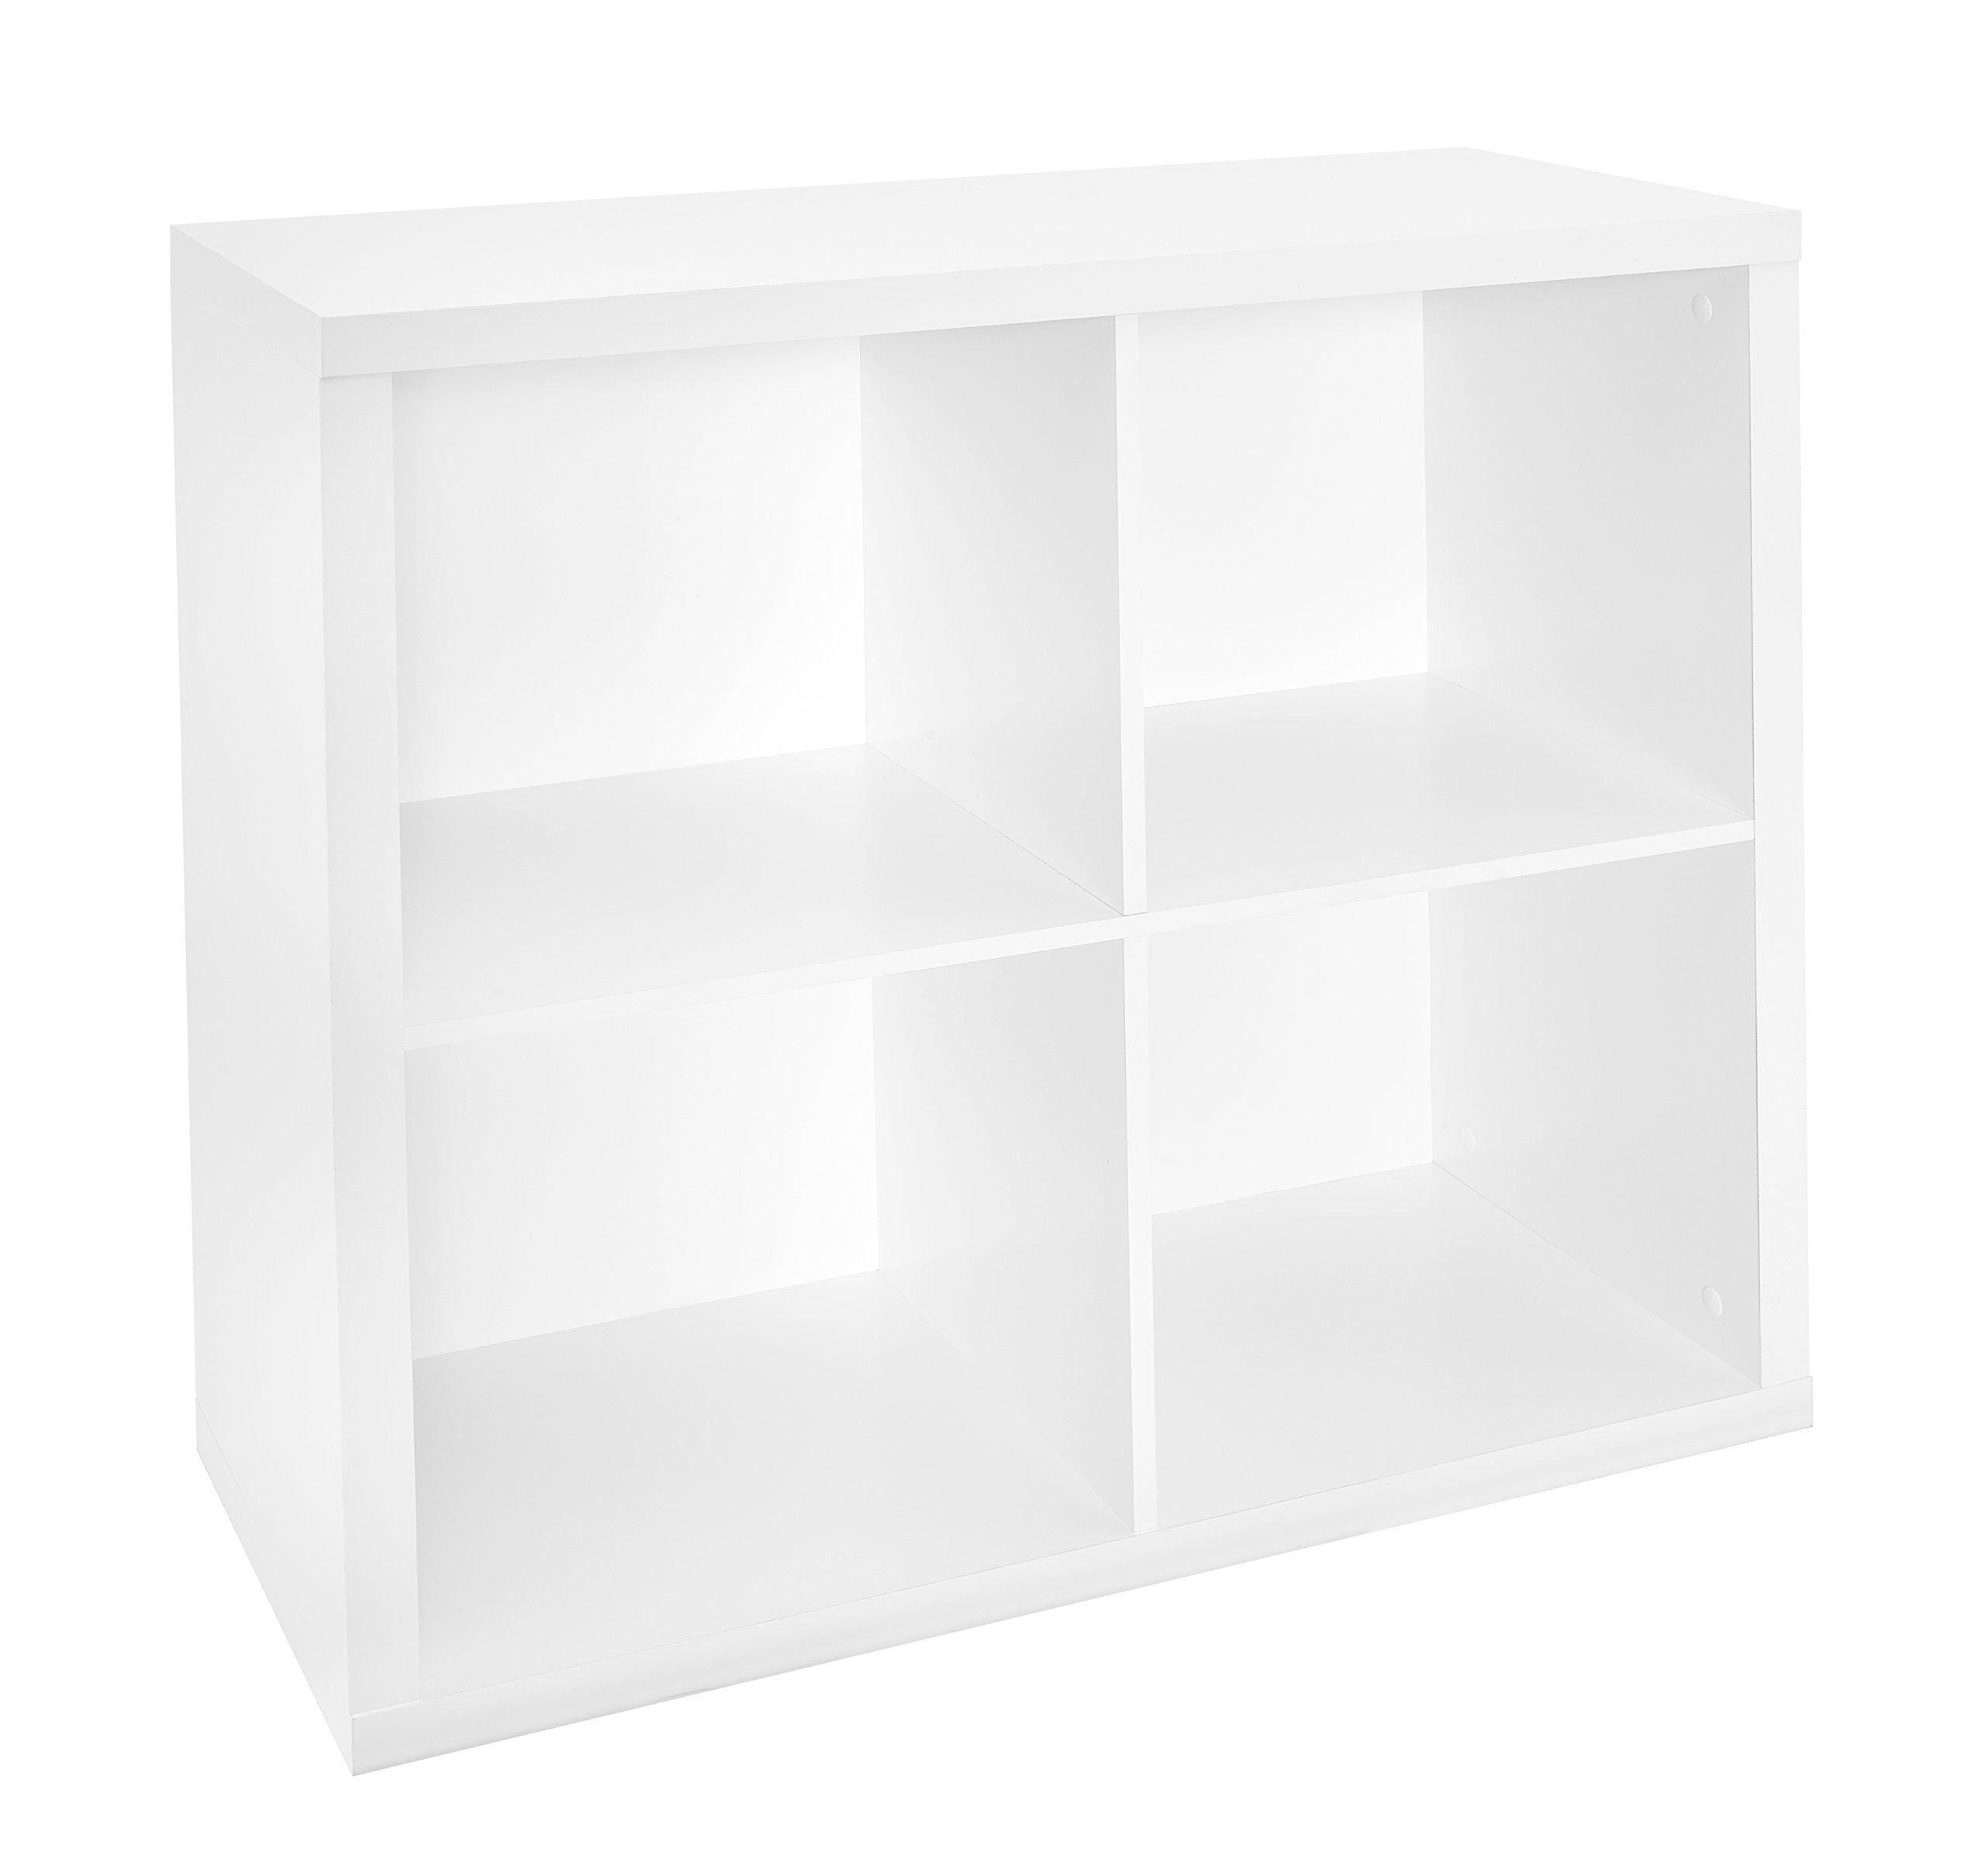 ClosetMaid 1108 Decorative 4-Cube Storage Organizer, White